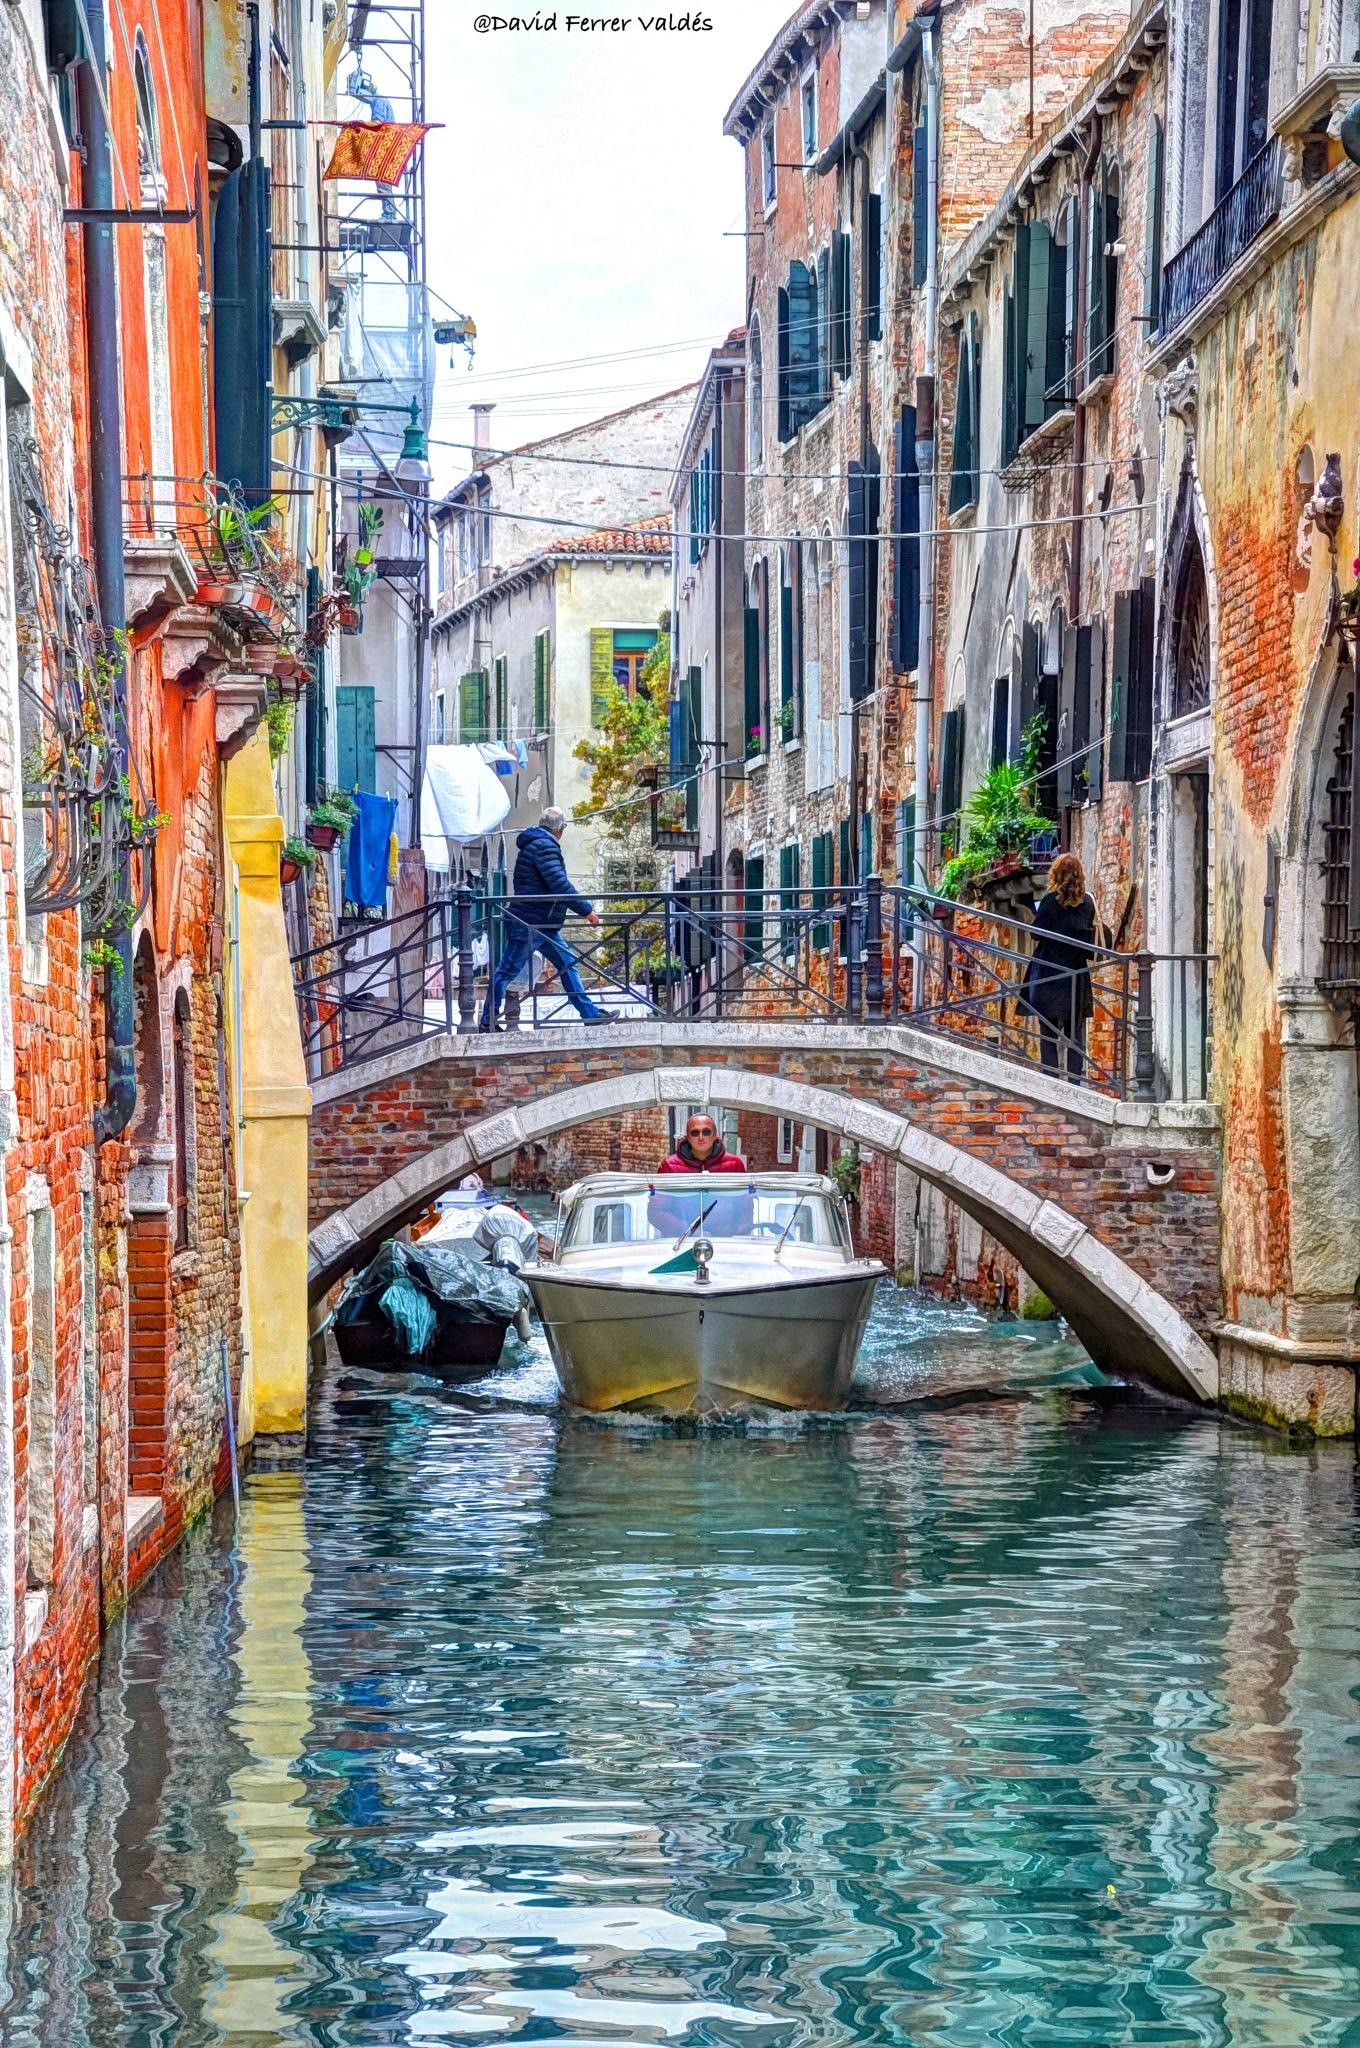 Narrow Venice by davidferrervaldes